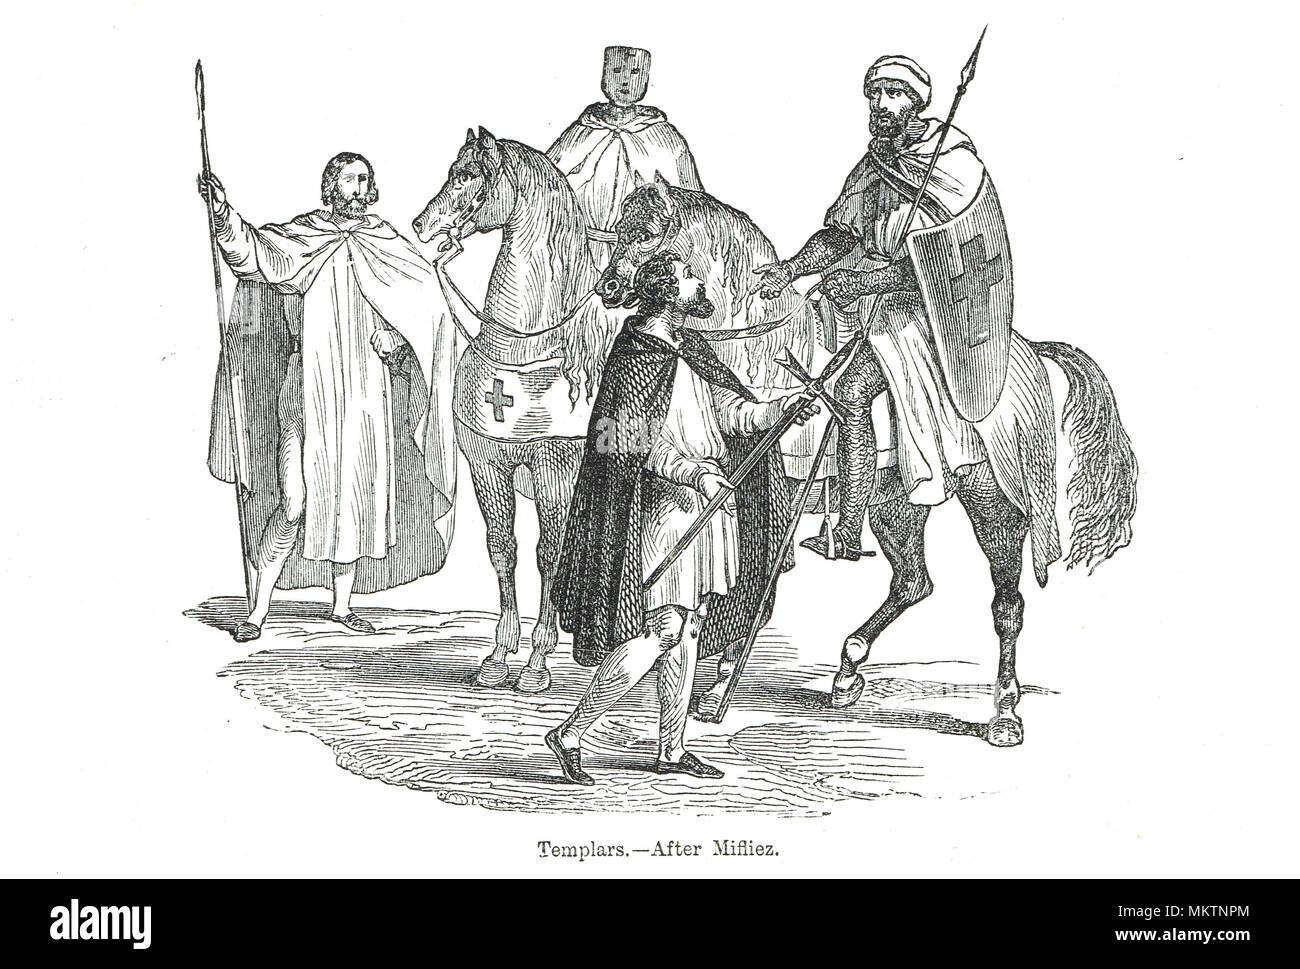 Knights Templars after Mifliez - Stock Image